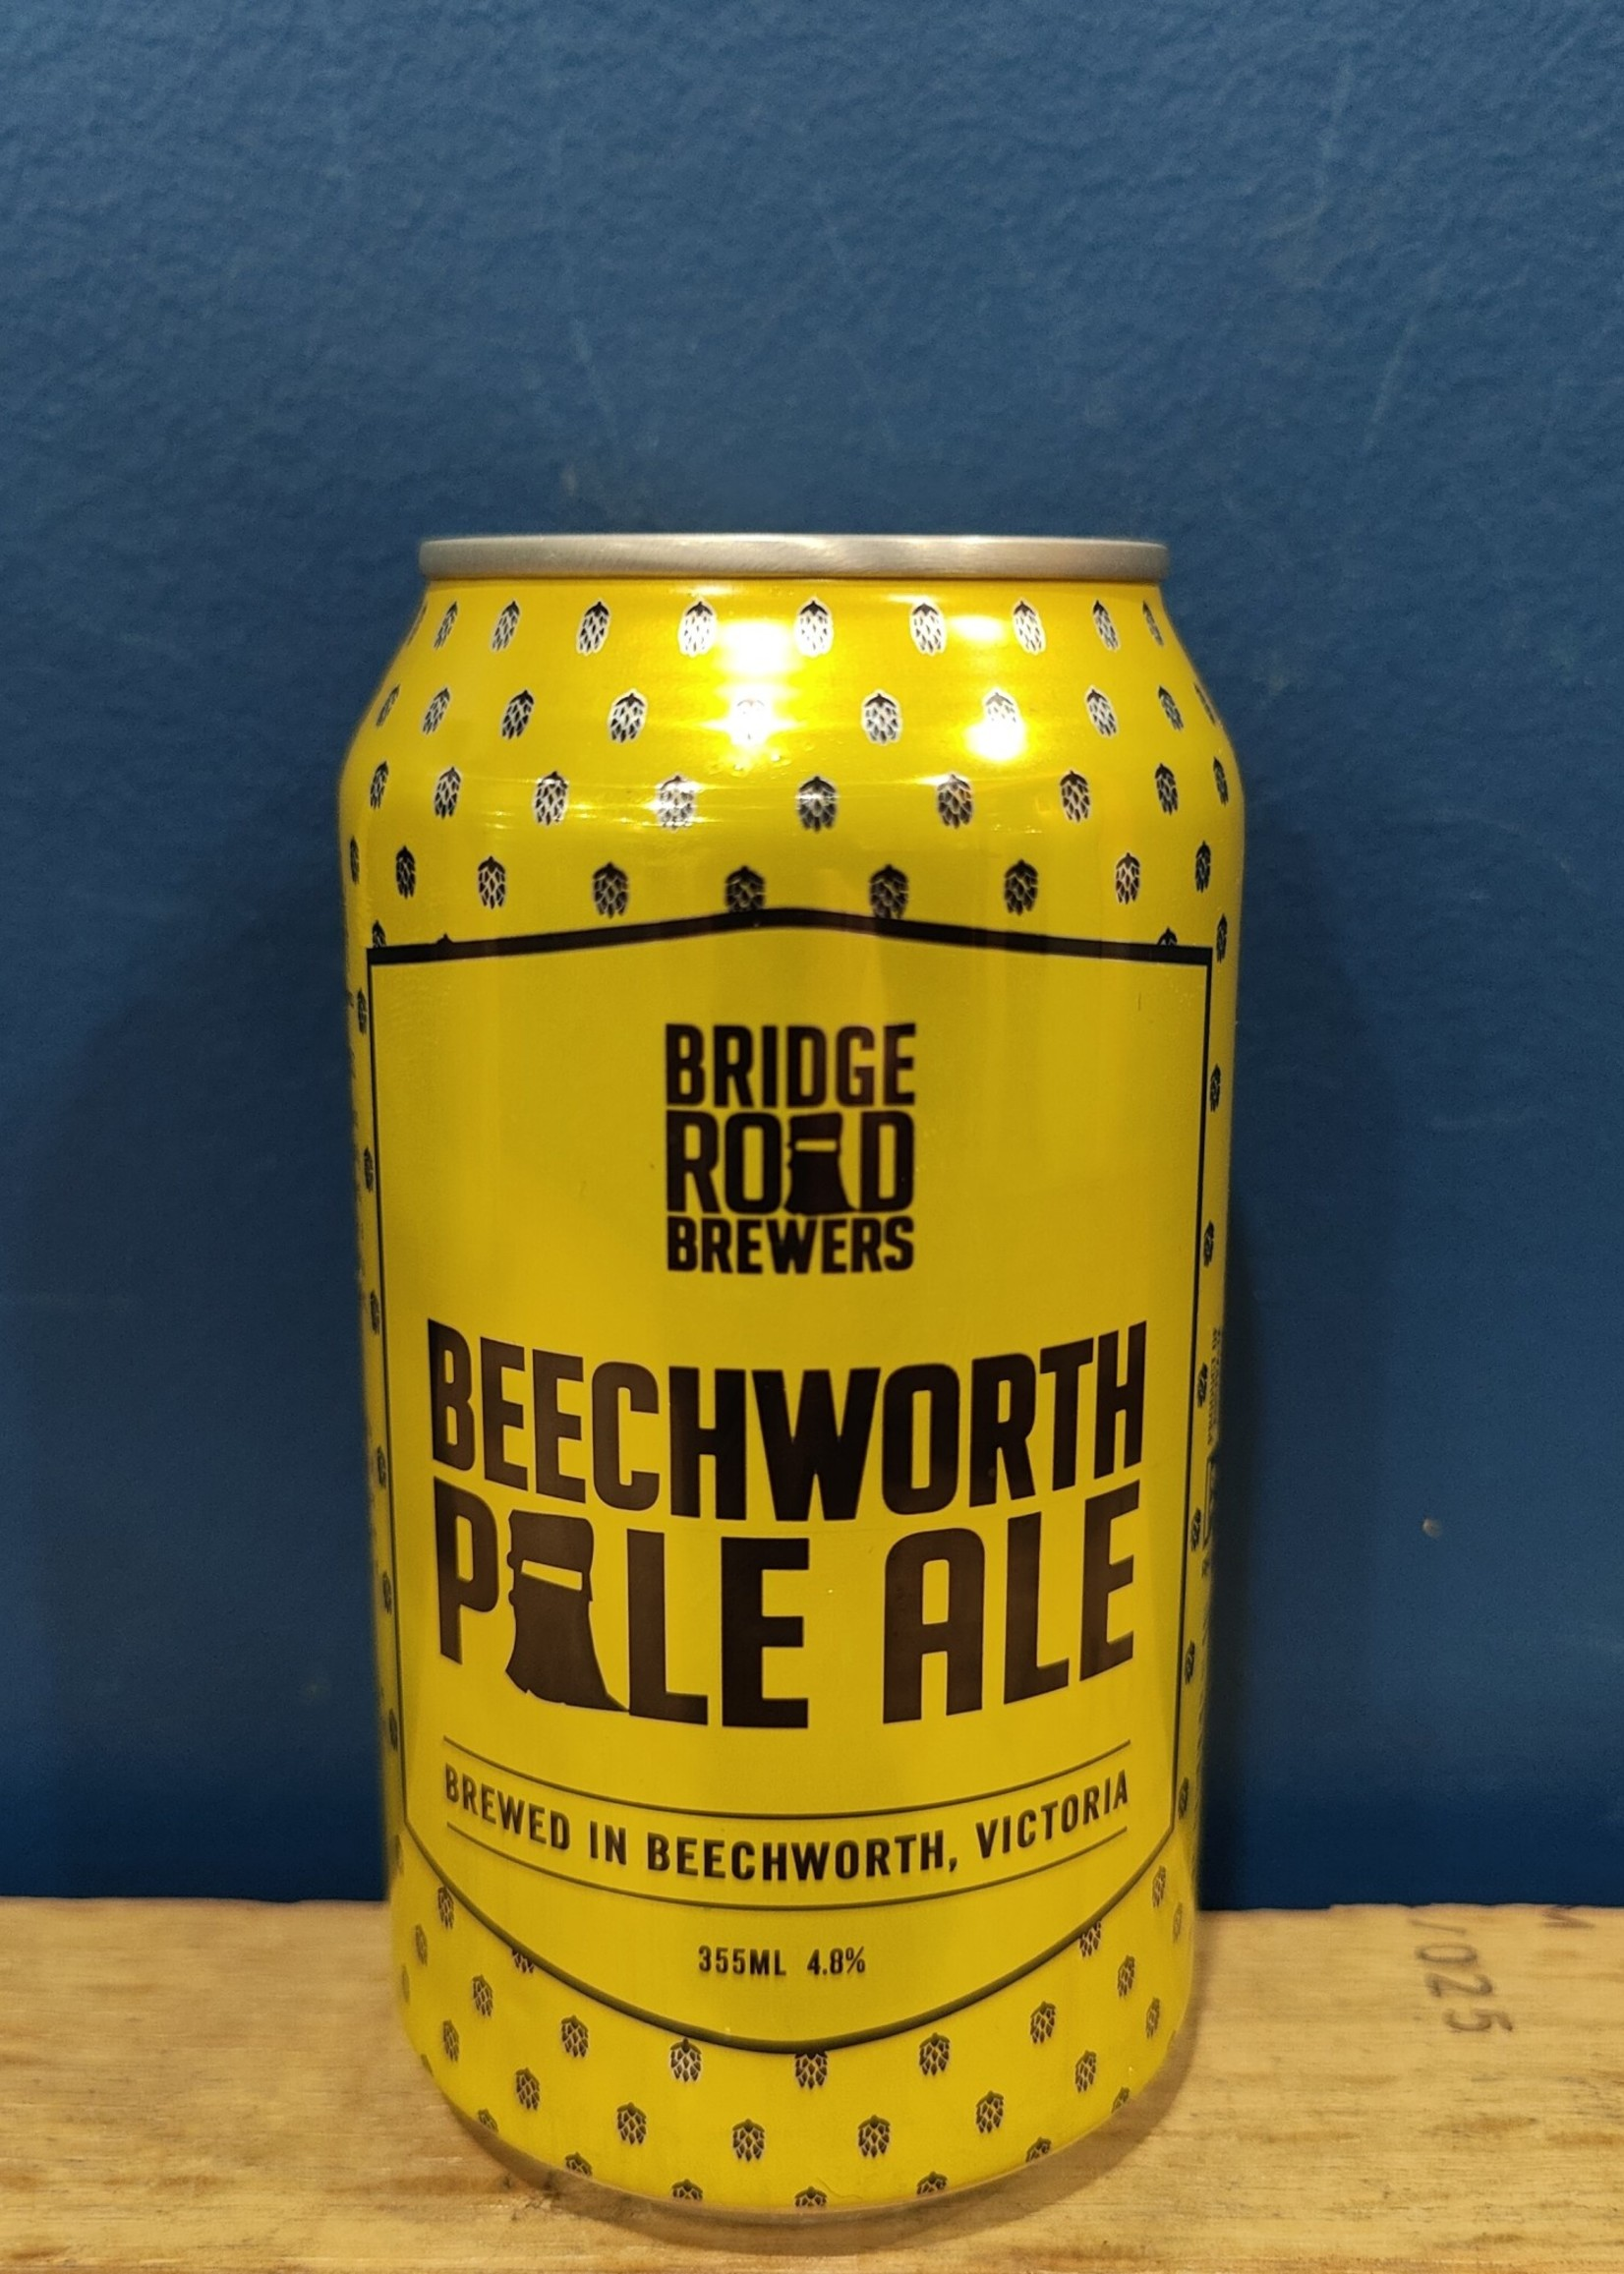 Bridge Road Brewers Beechworth Pale Ale